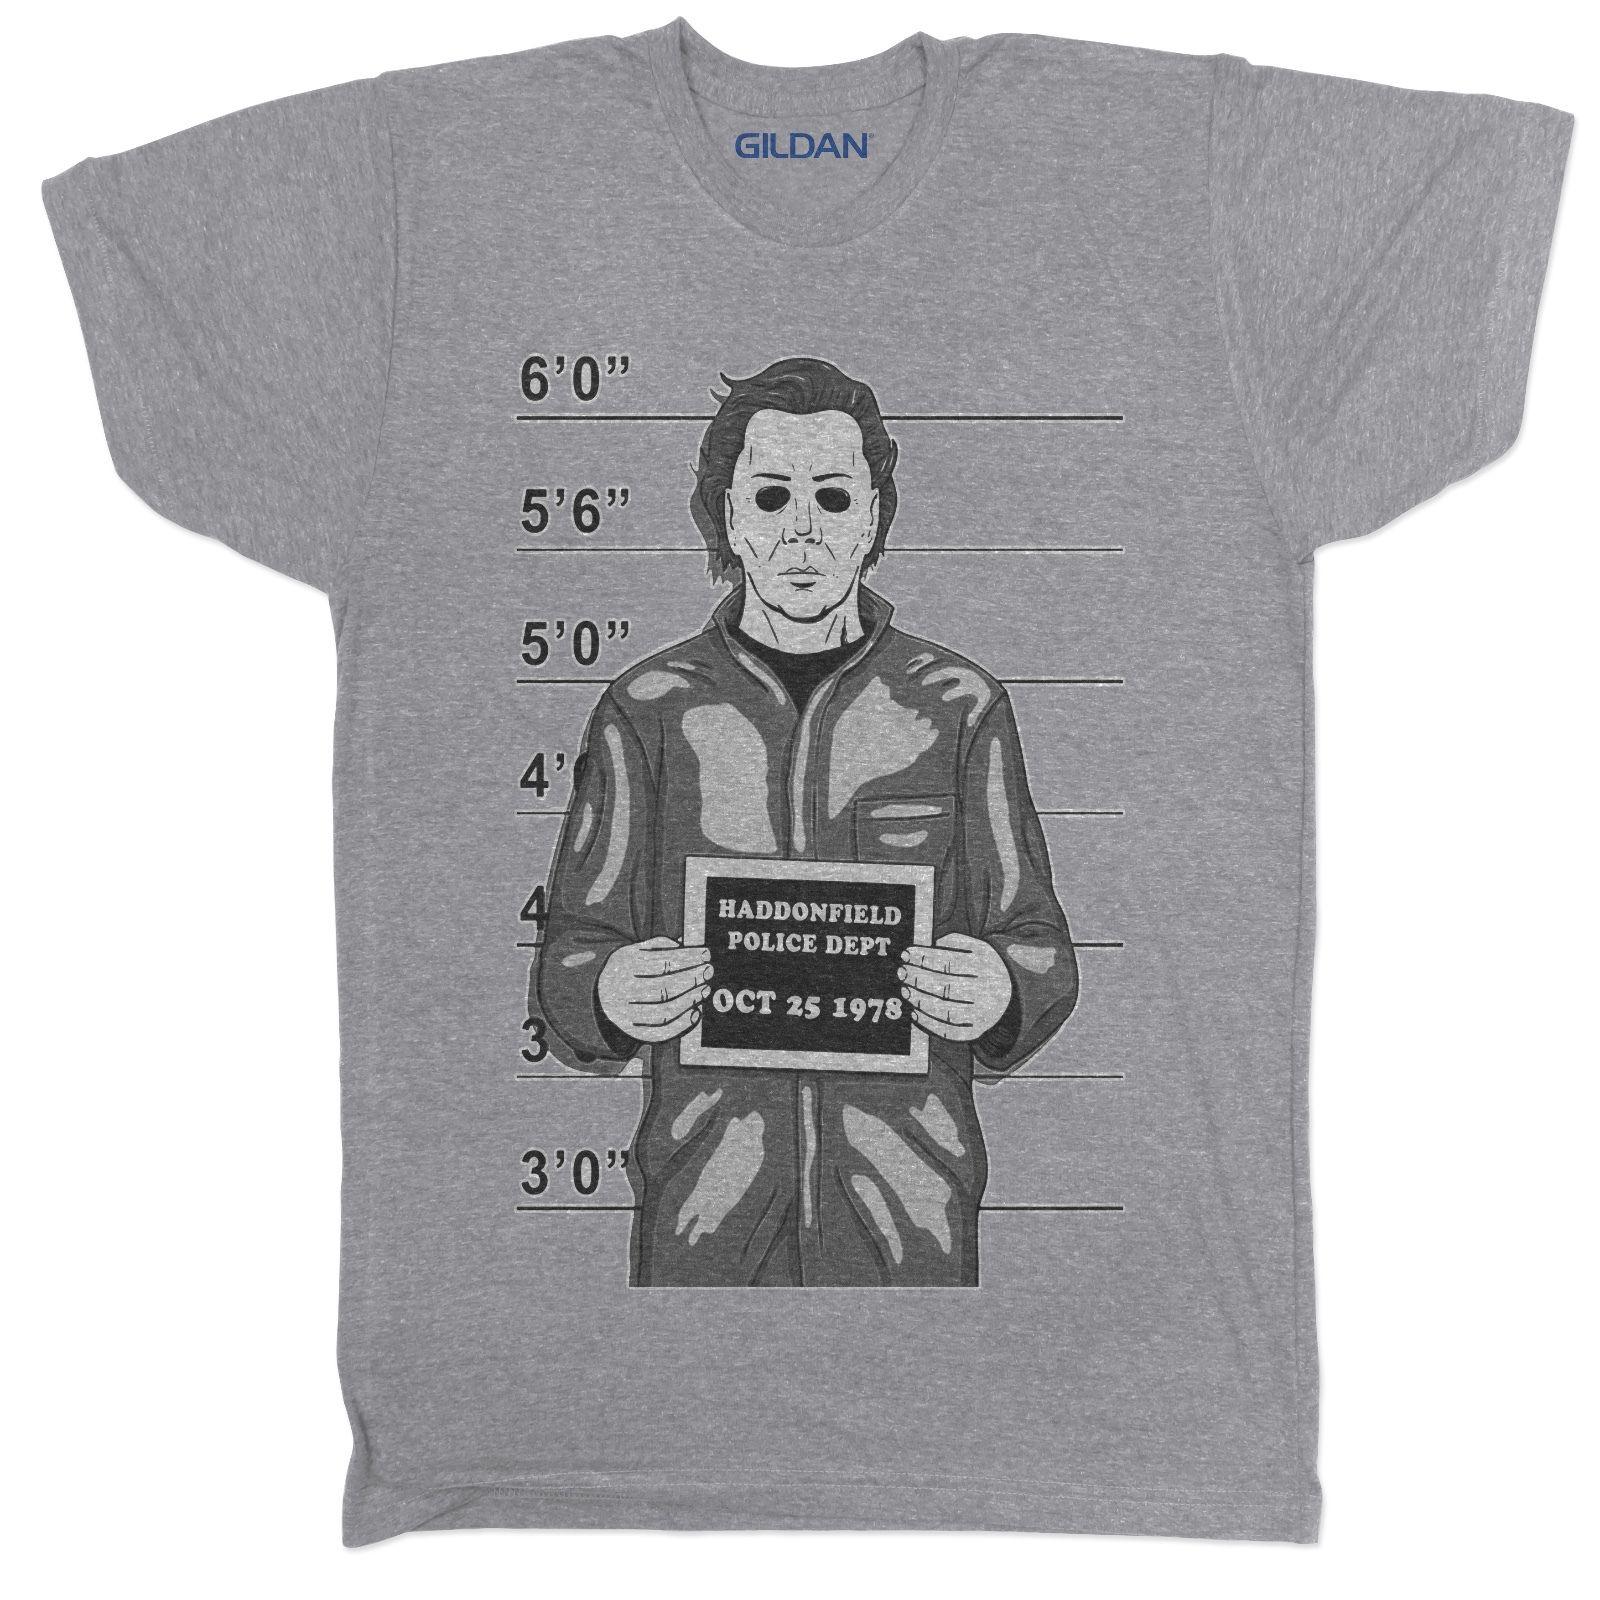 2018 Summer Men Tee Shirt MICHAEL MYERS HALLOWEEN HORROR MOVIE FILM 90S RETRO CLASSIC GREY T SHIRT Custom Made T-shirt